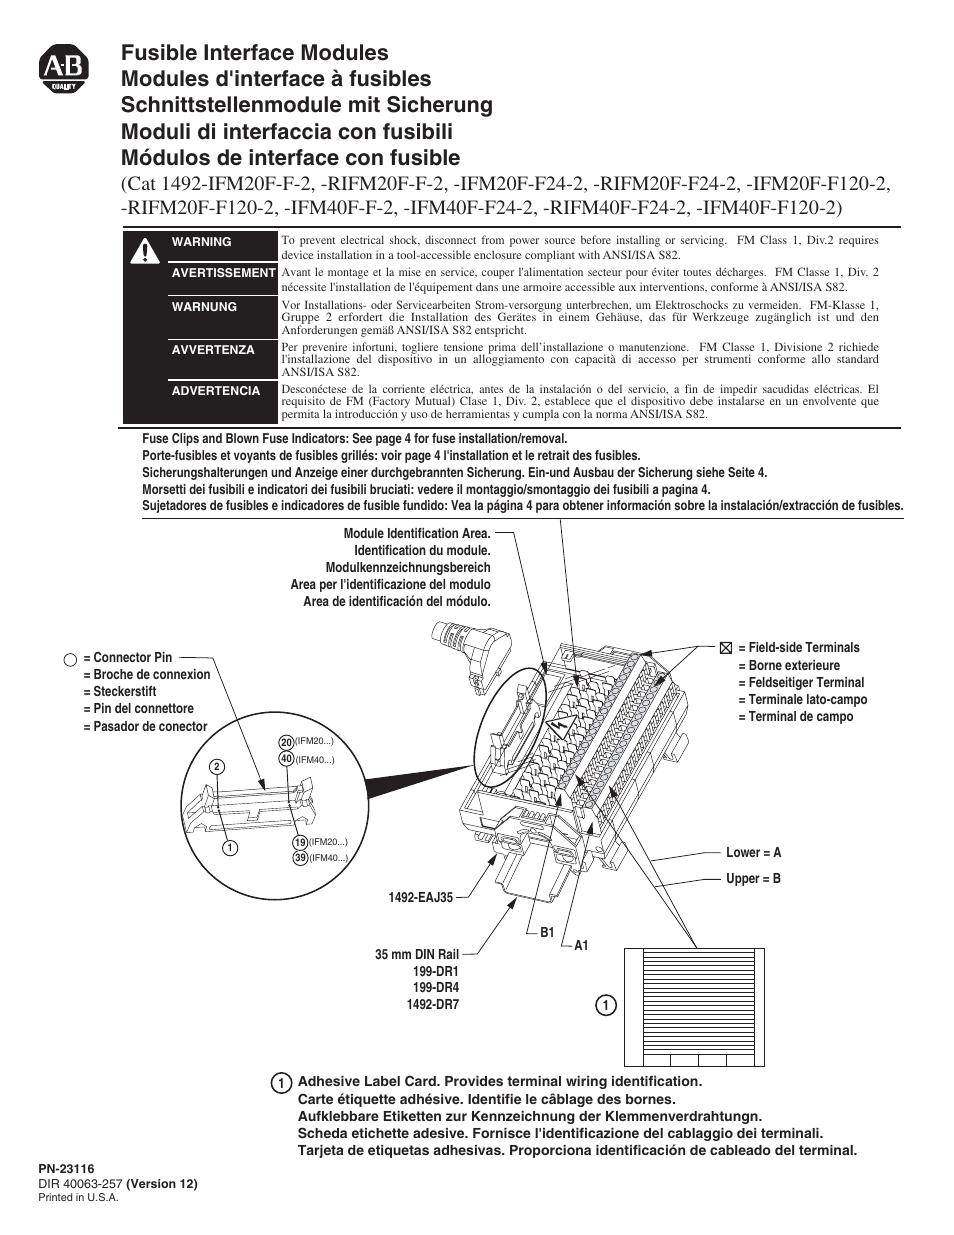 1492 ifm40f f24 2 wiring diagram free download  u2022 oasis